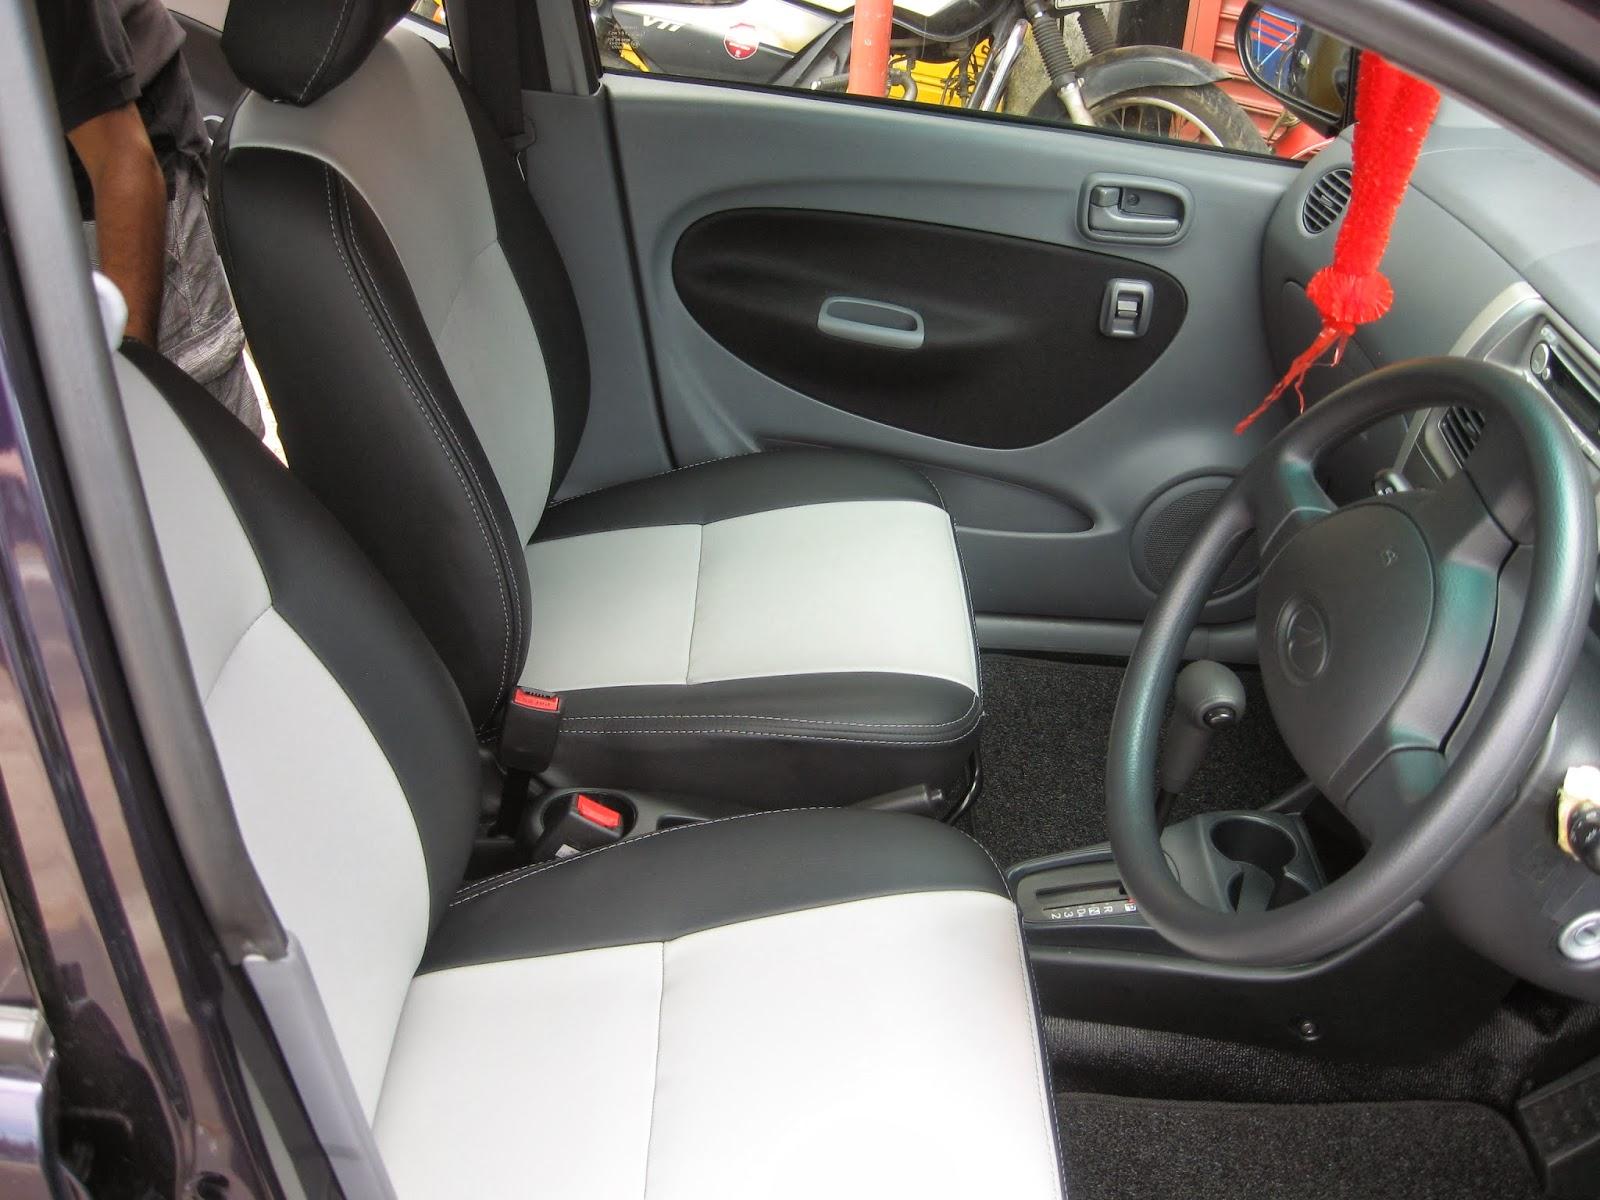 Viva Elite Leather Seat Covers Two Tone Design Vip Car Interiors